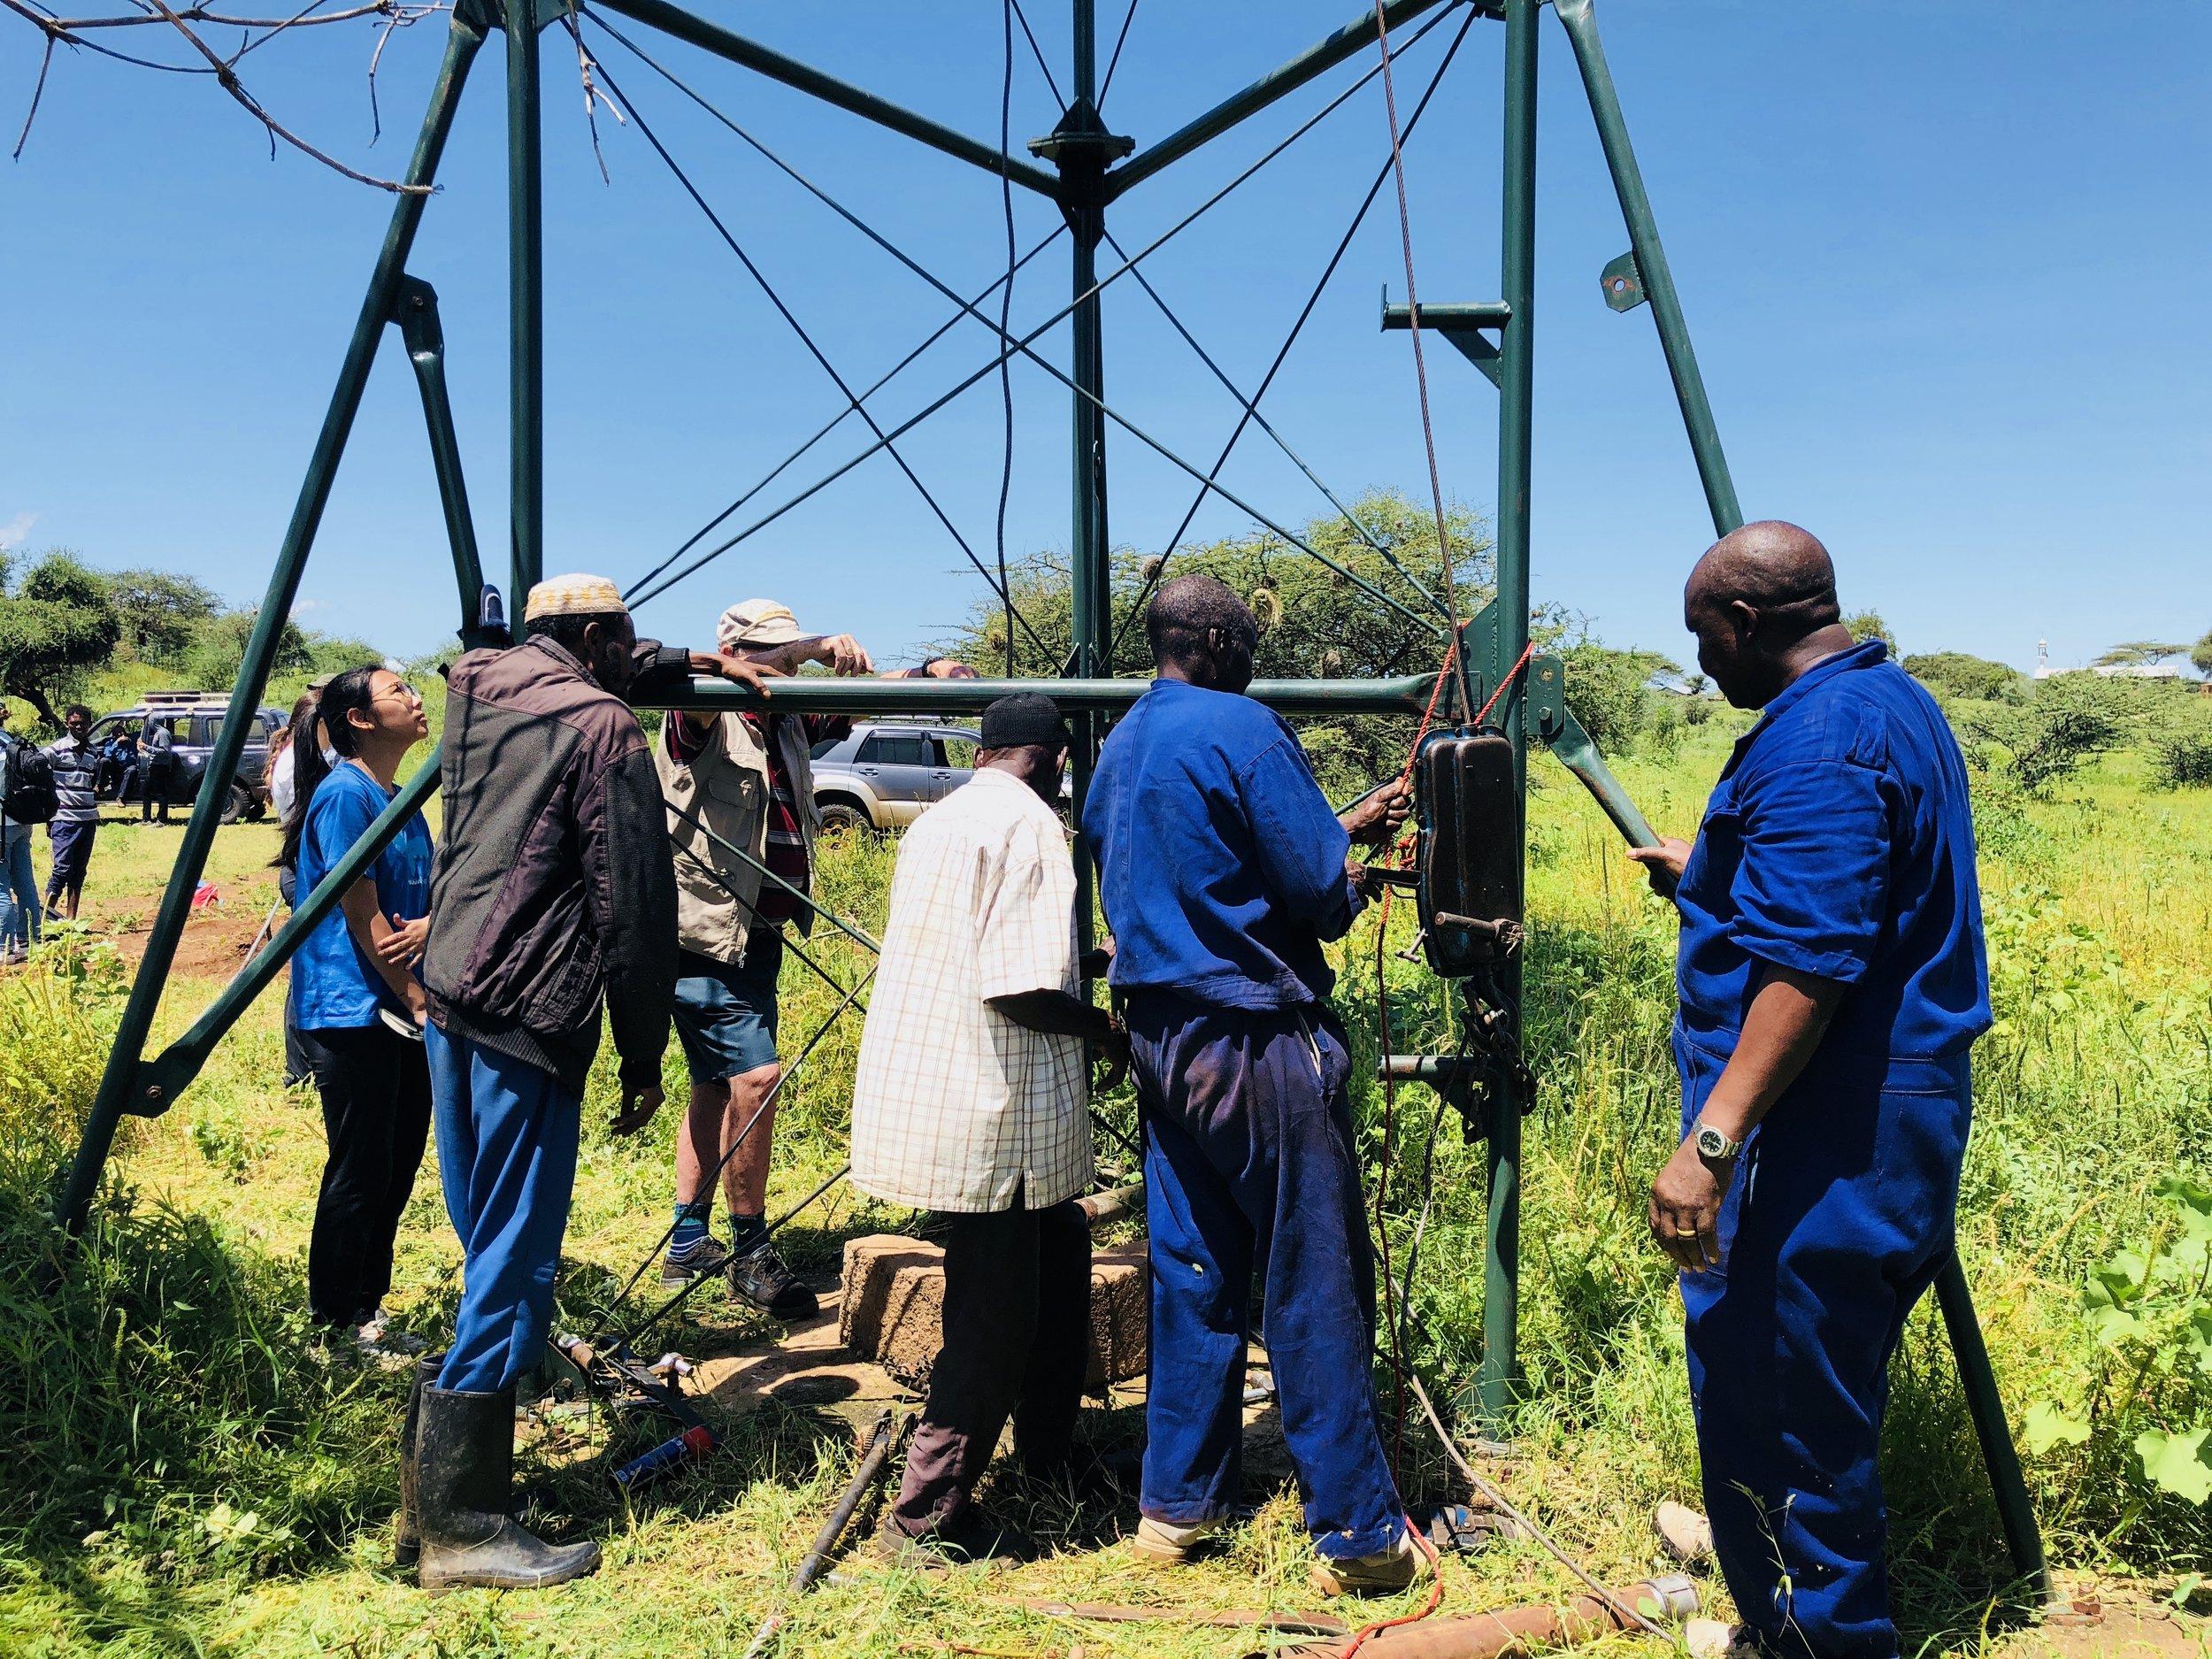 Working on assessing the broken windmill pump in Gambella Kenya, May 2018.